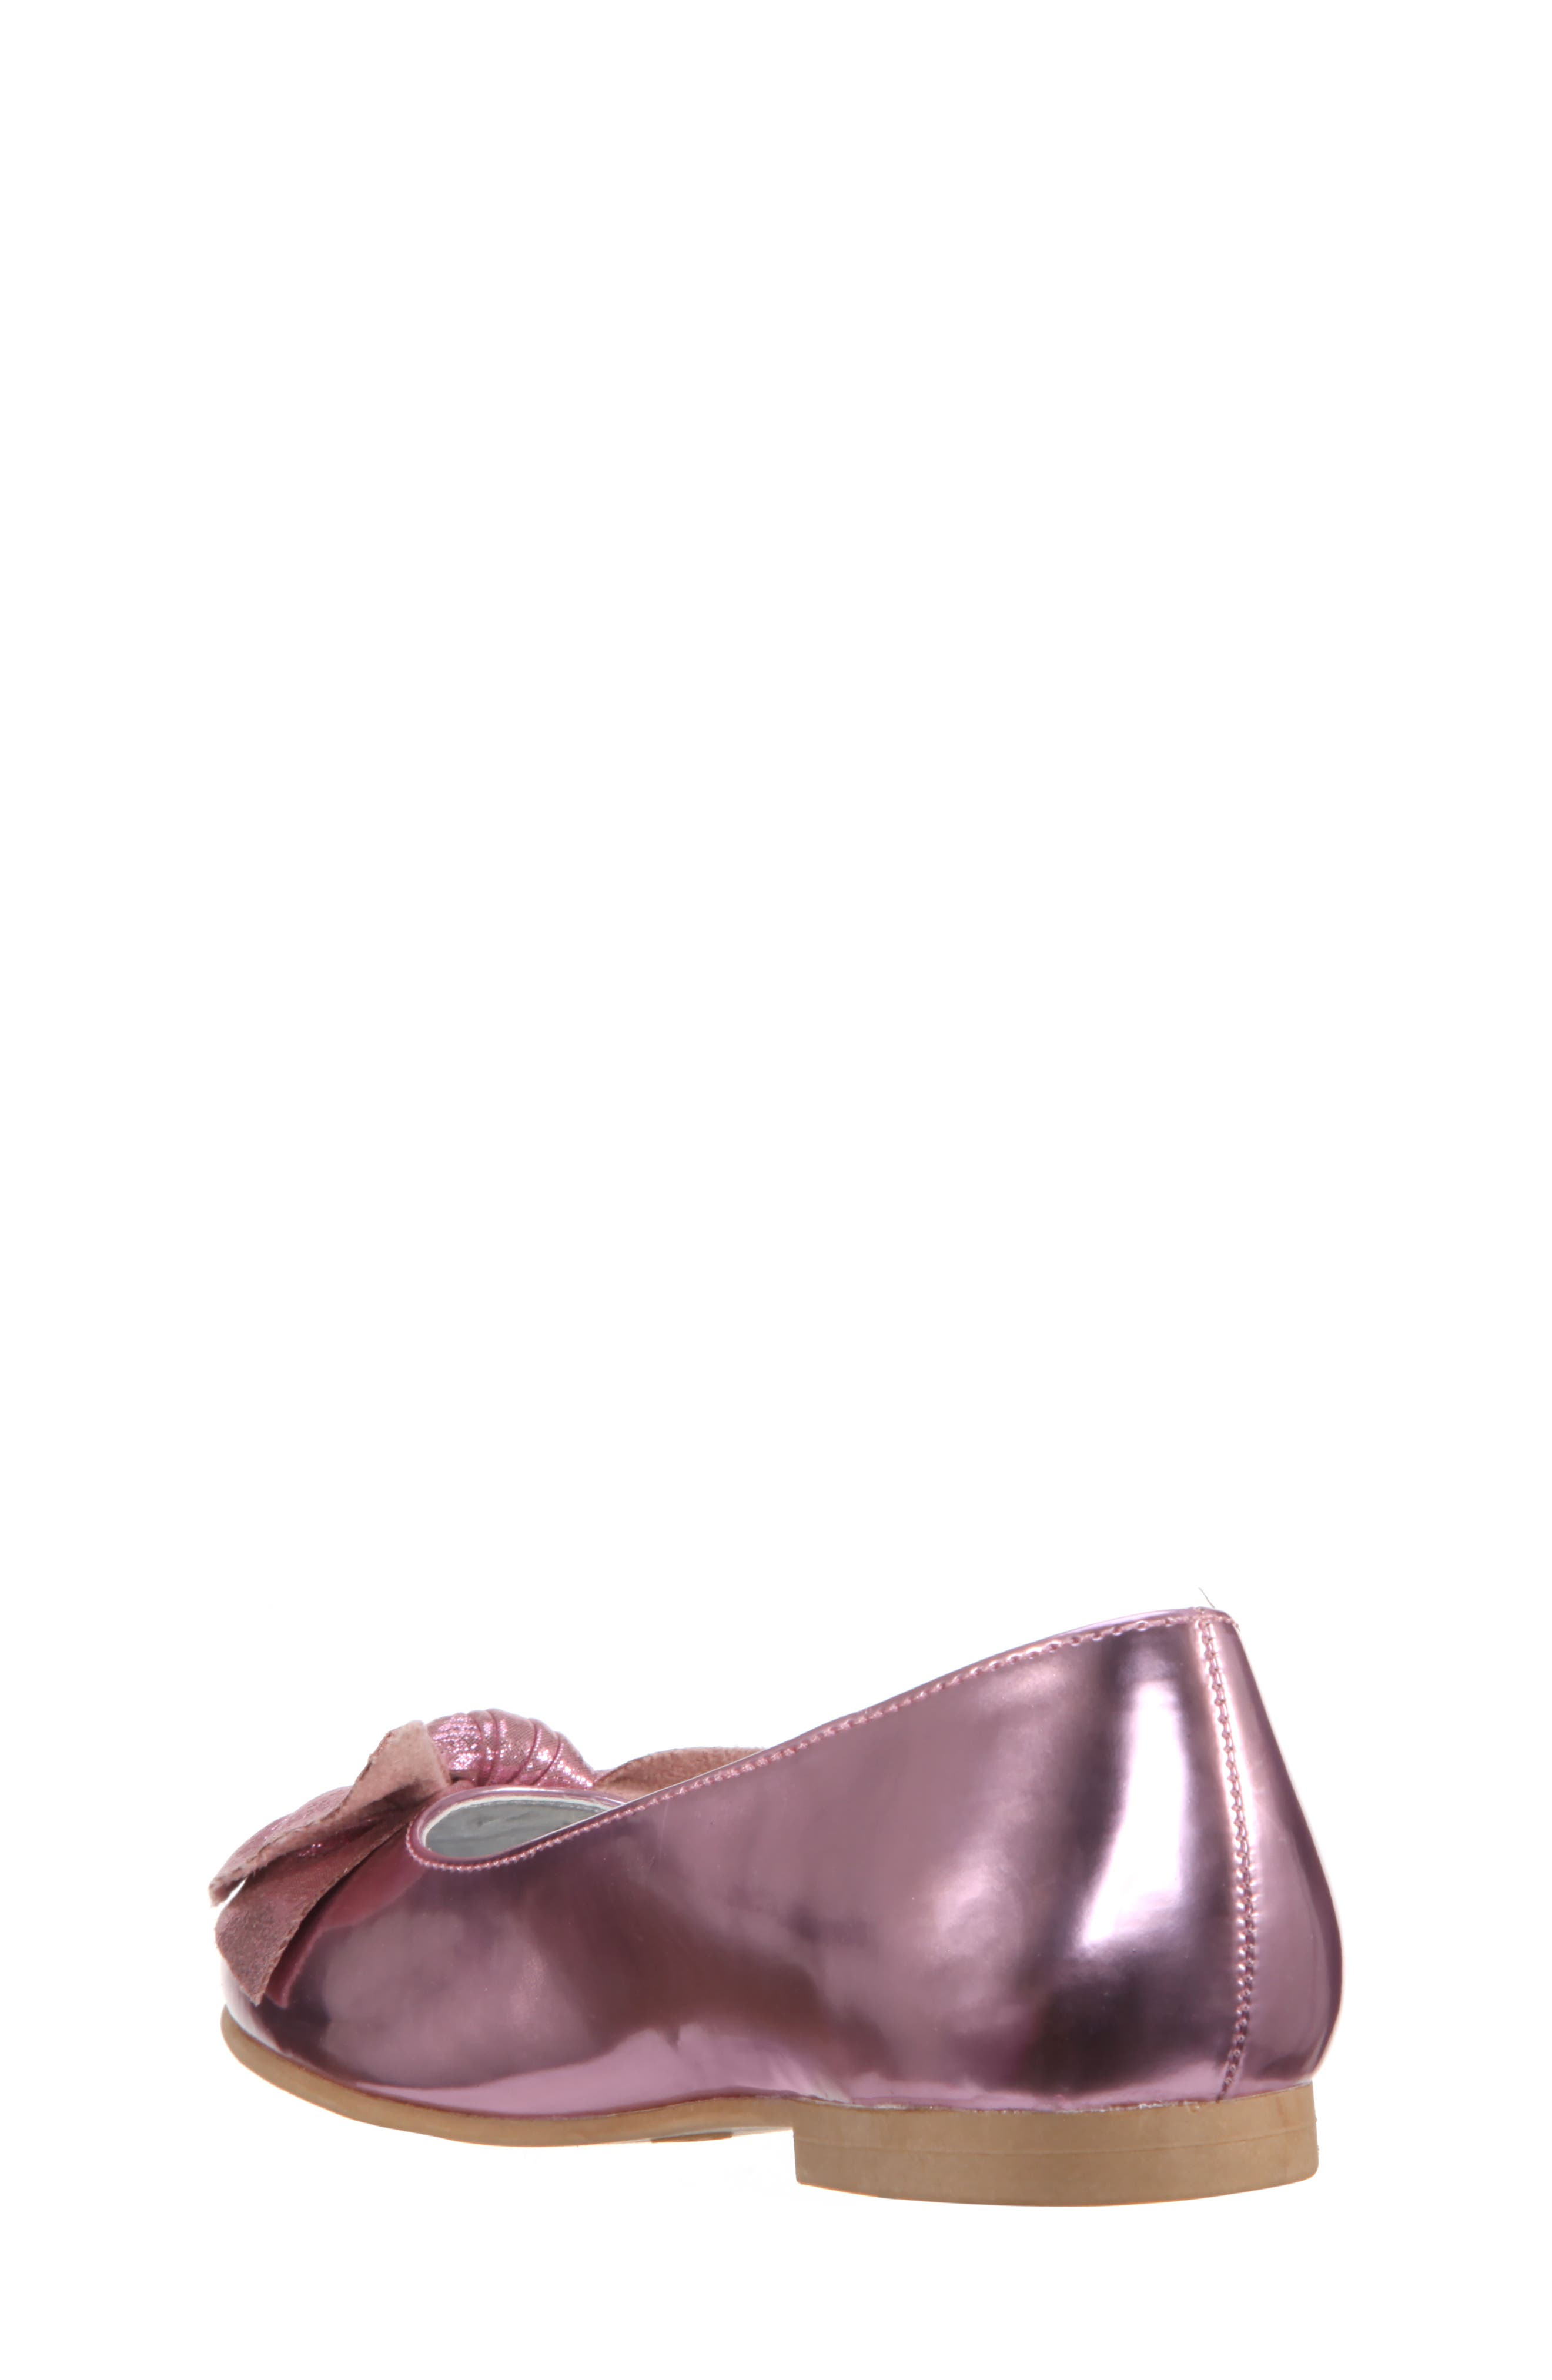 Katelyn Glitter Bow Metallic Ballet Flat,                             Alternate thumbnail 2, color,                             Pink Mirror Metallic